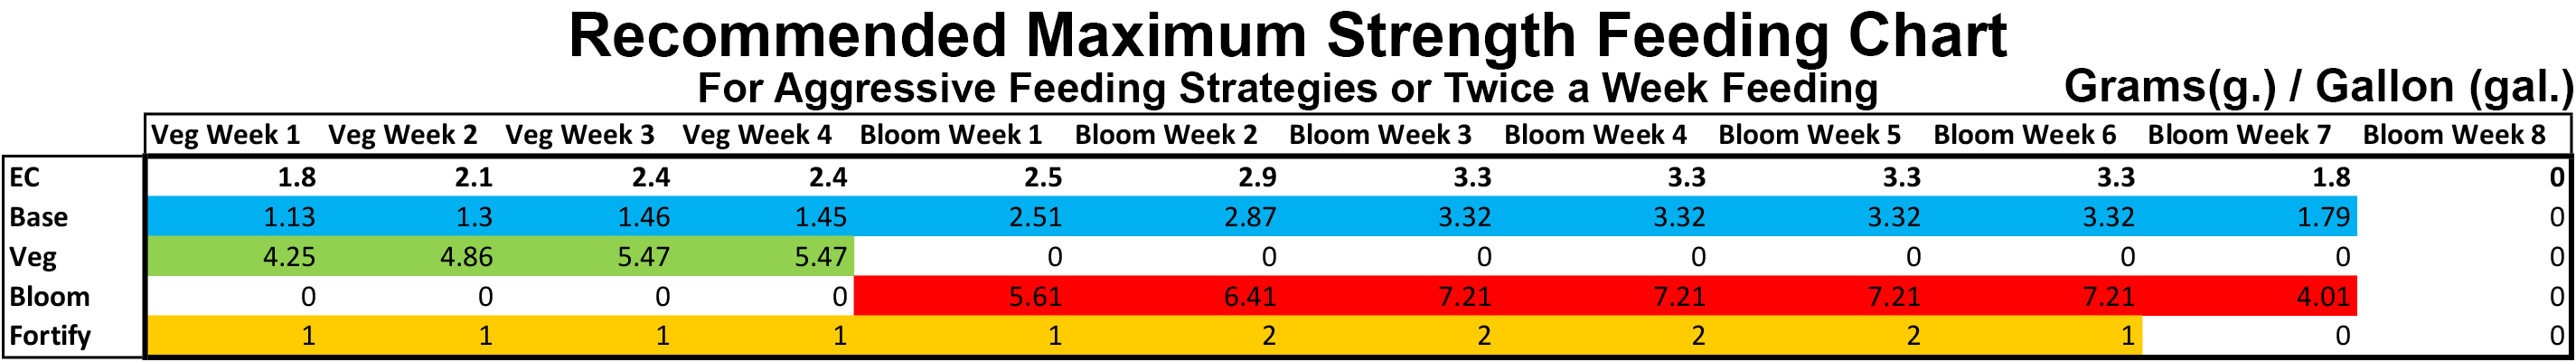 strong_strength_feeding.png?ssl=1